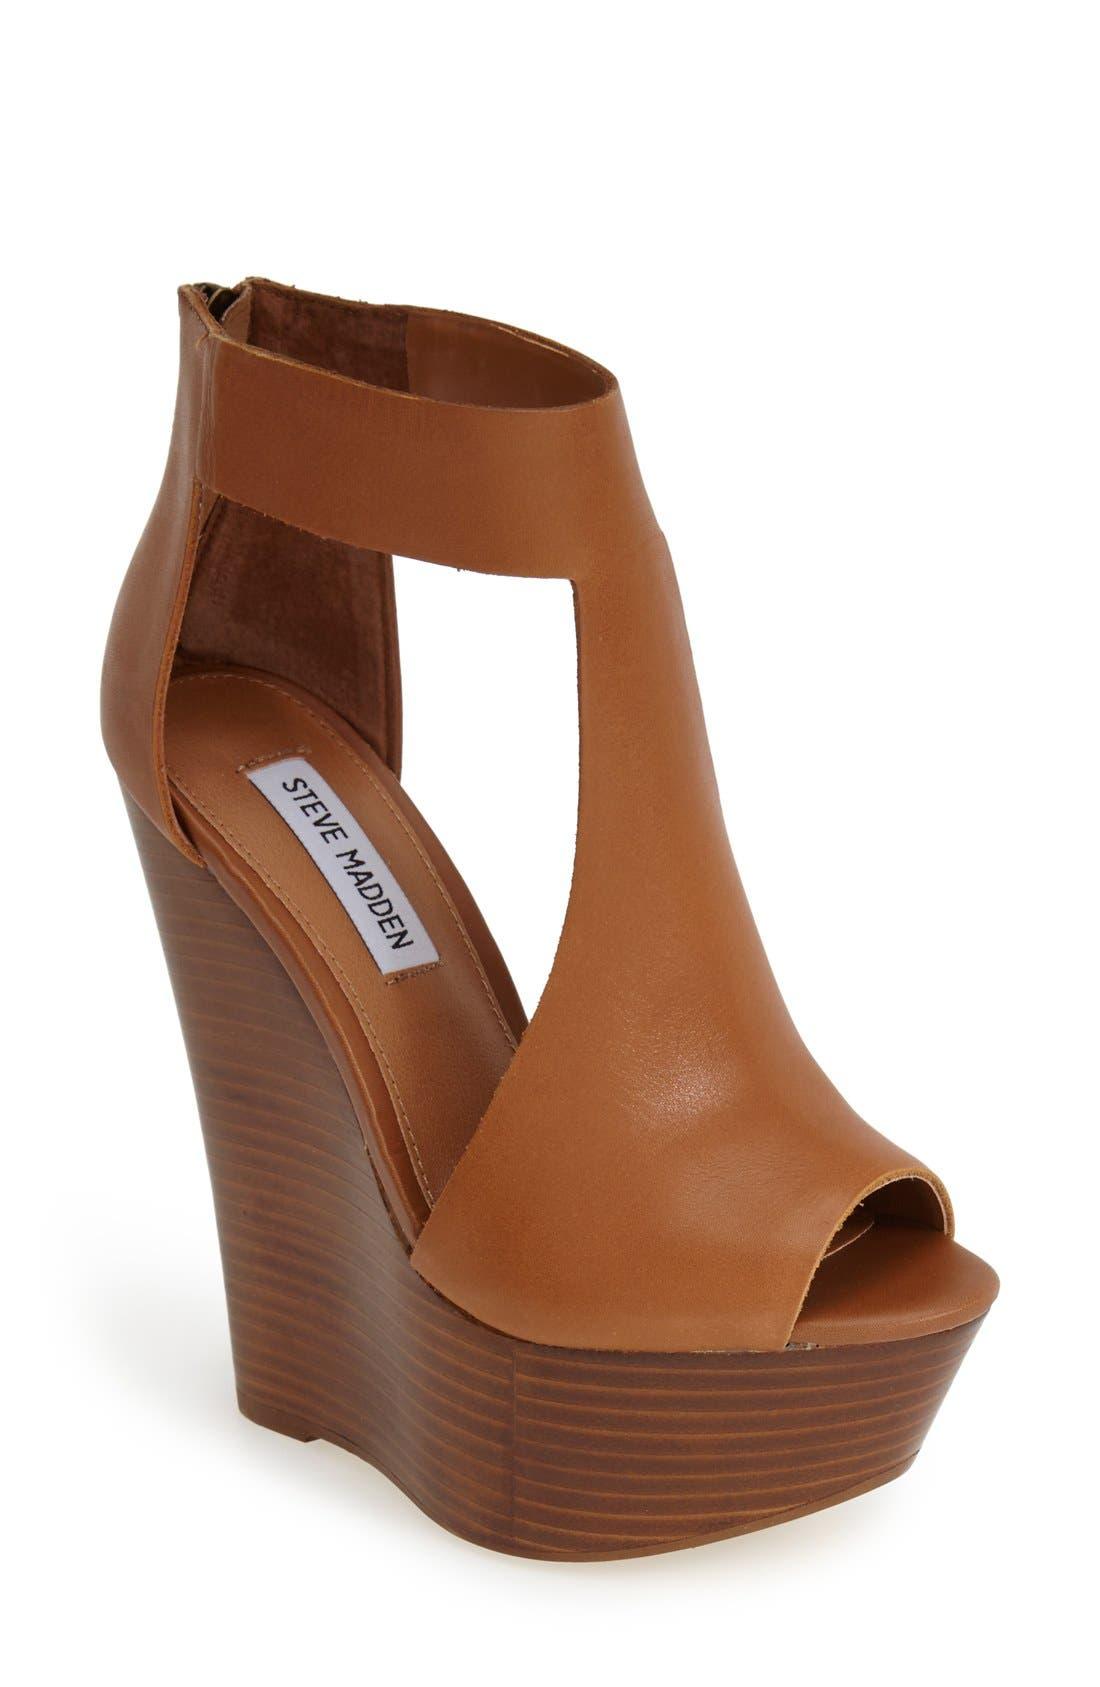 Main Image - Steve Madden 'Gunnther' Platform Wedge Sandal (Women)